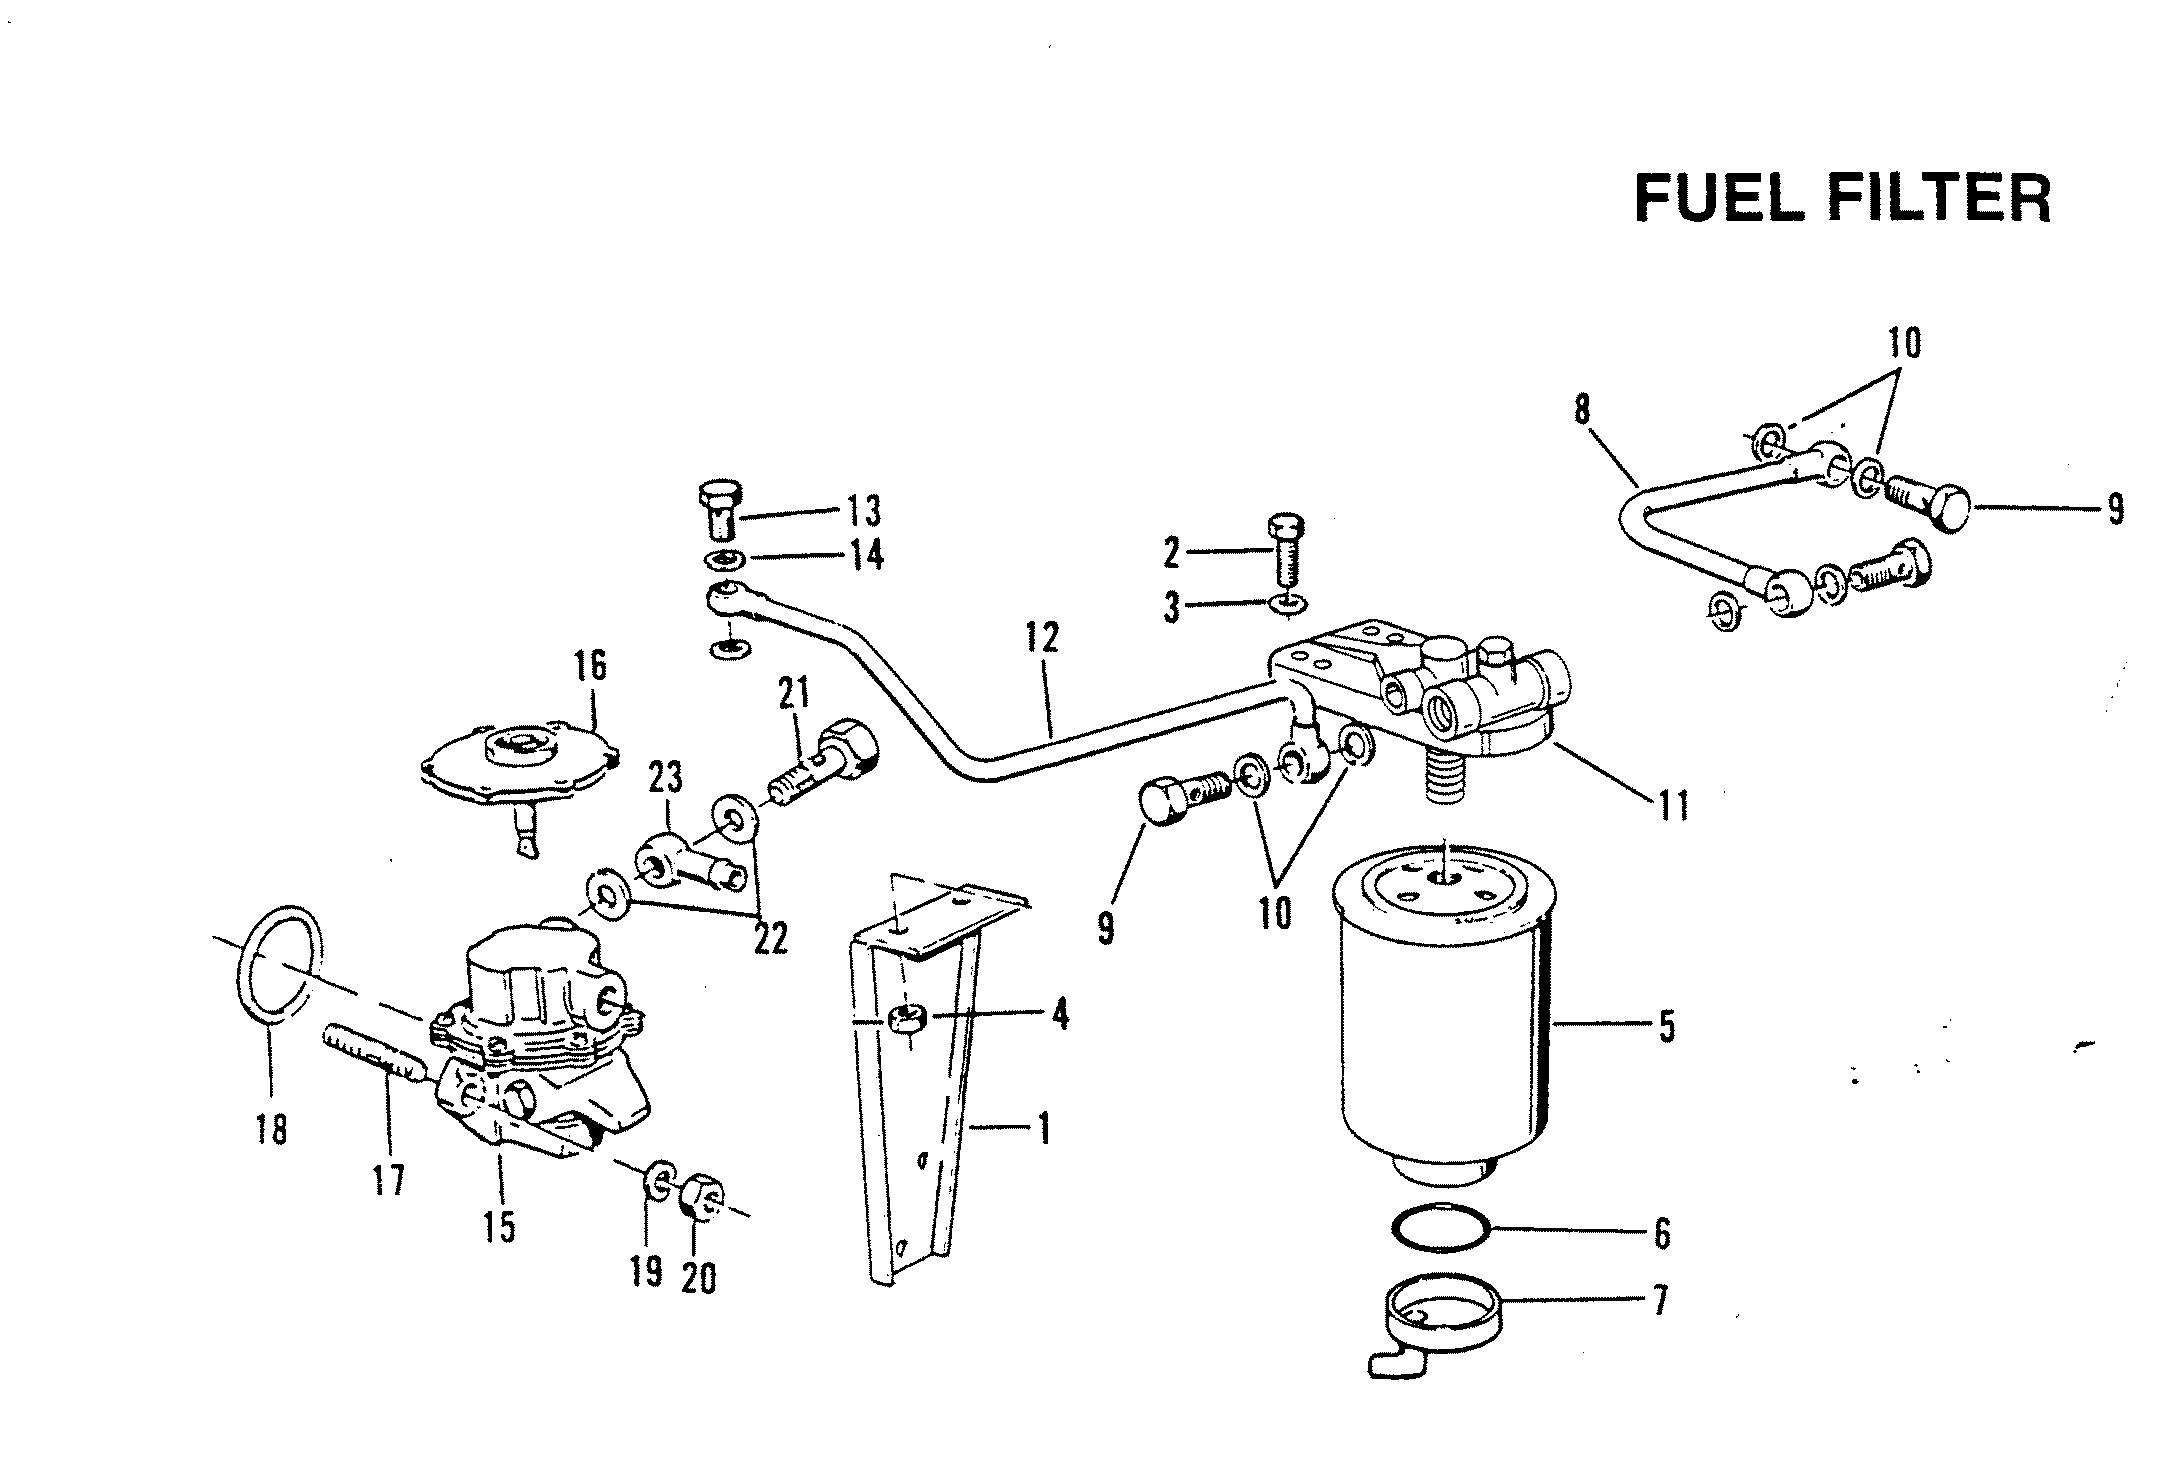 mercury mercruiser d254 turbo ac bravo vm 254 i l6 1990 1993 rh vansoutboardparts com Parts Manual Manual Book